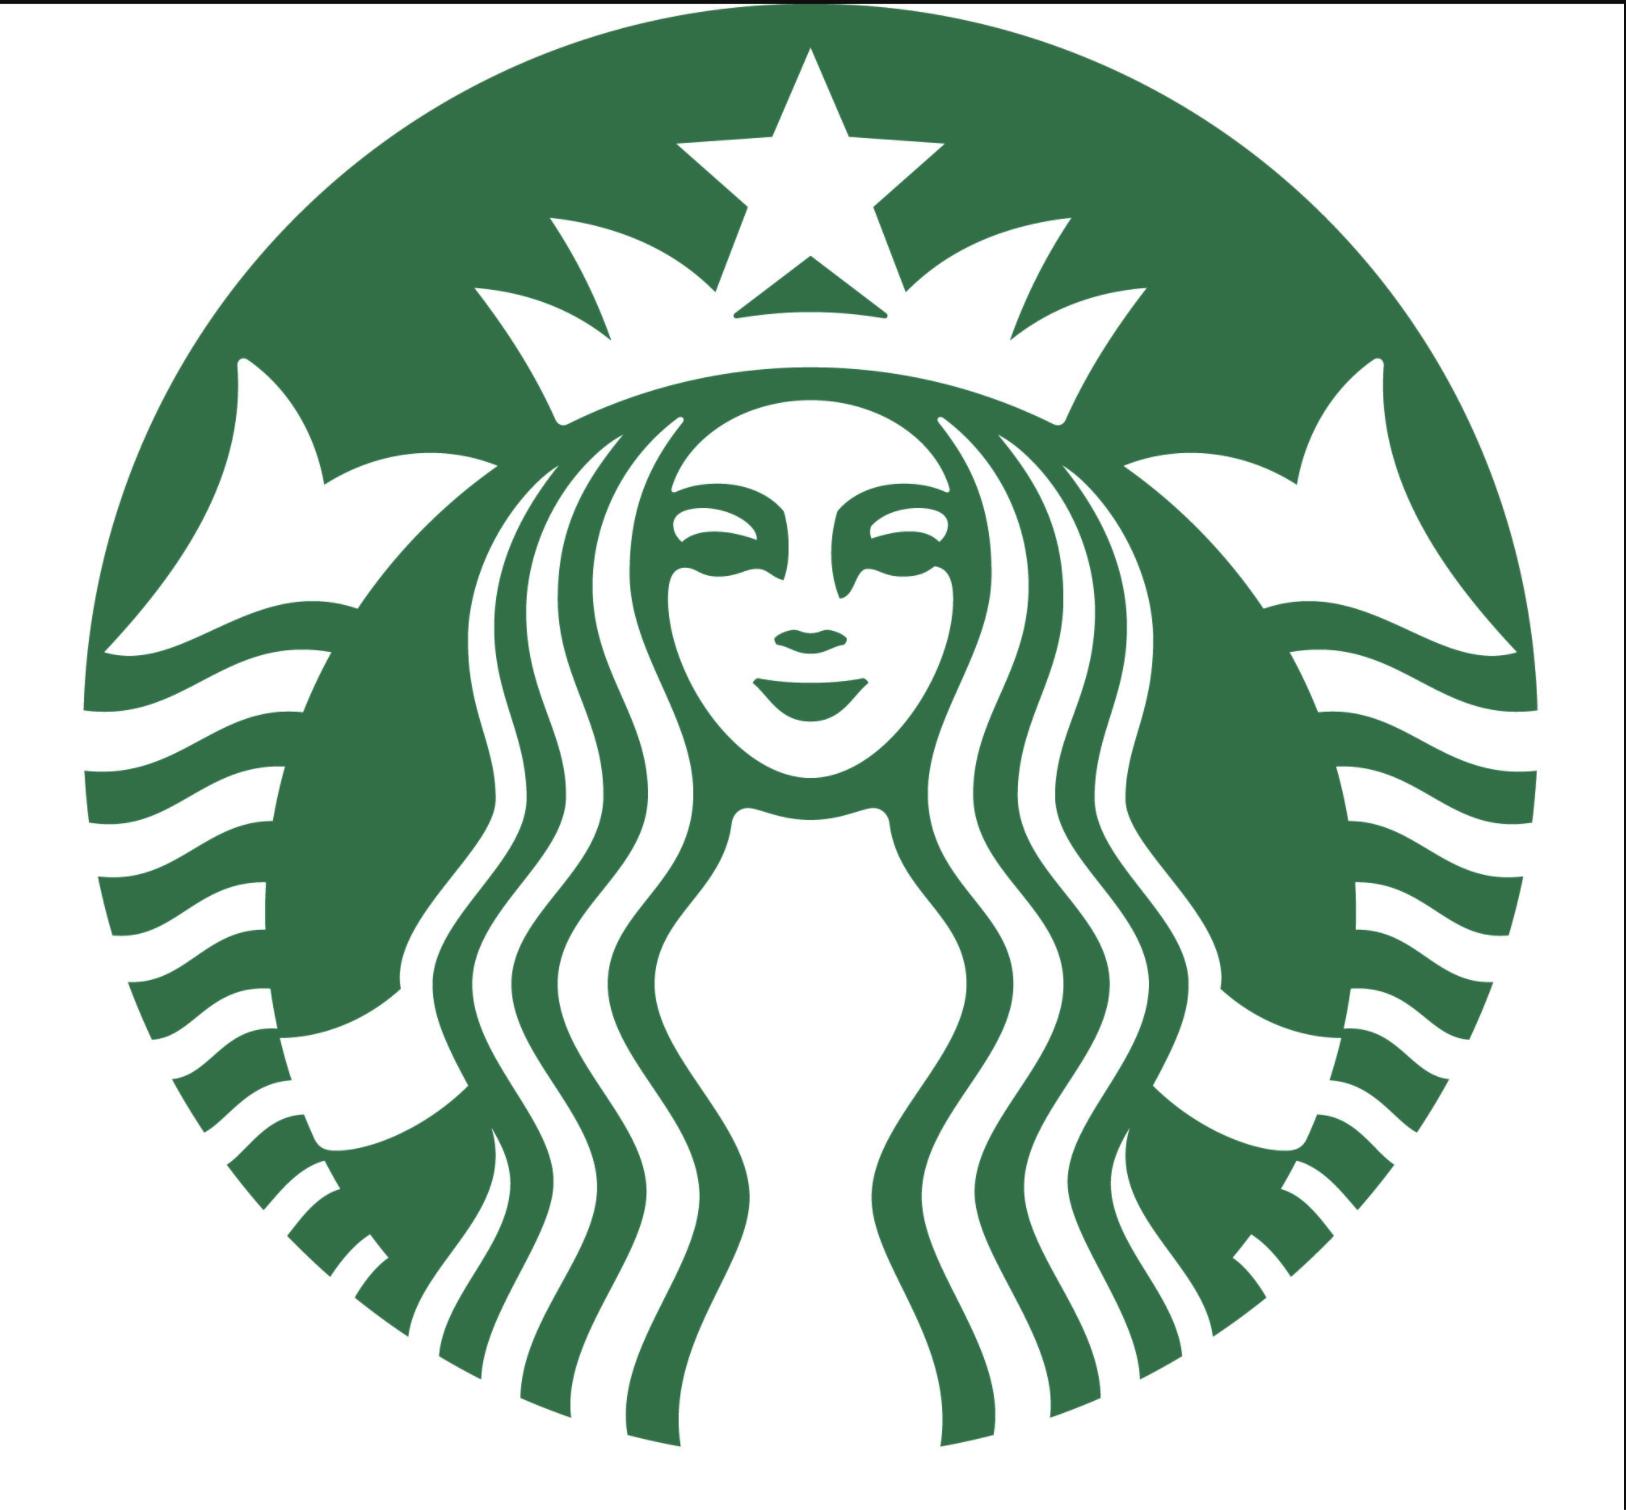 Starbucks, Magnolia